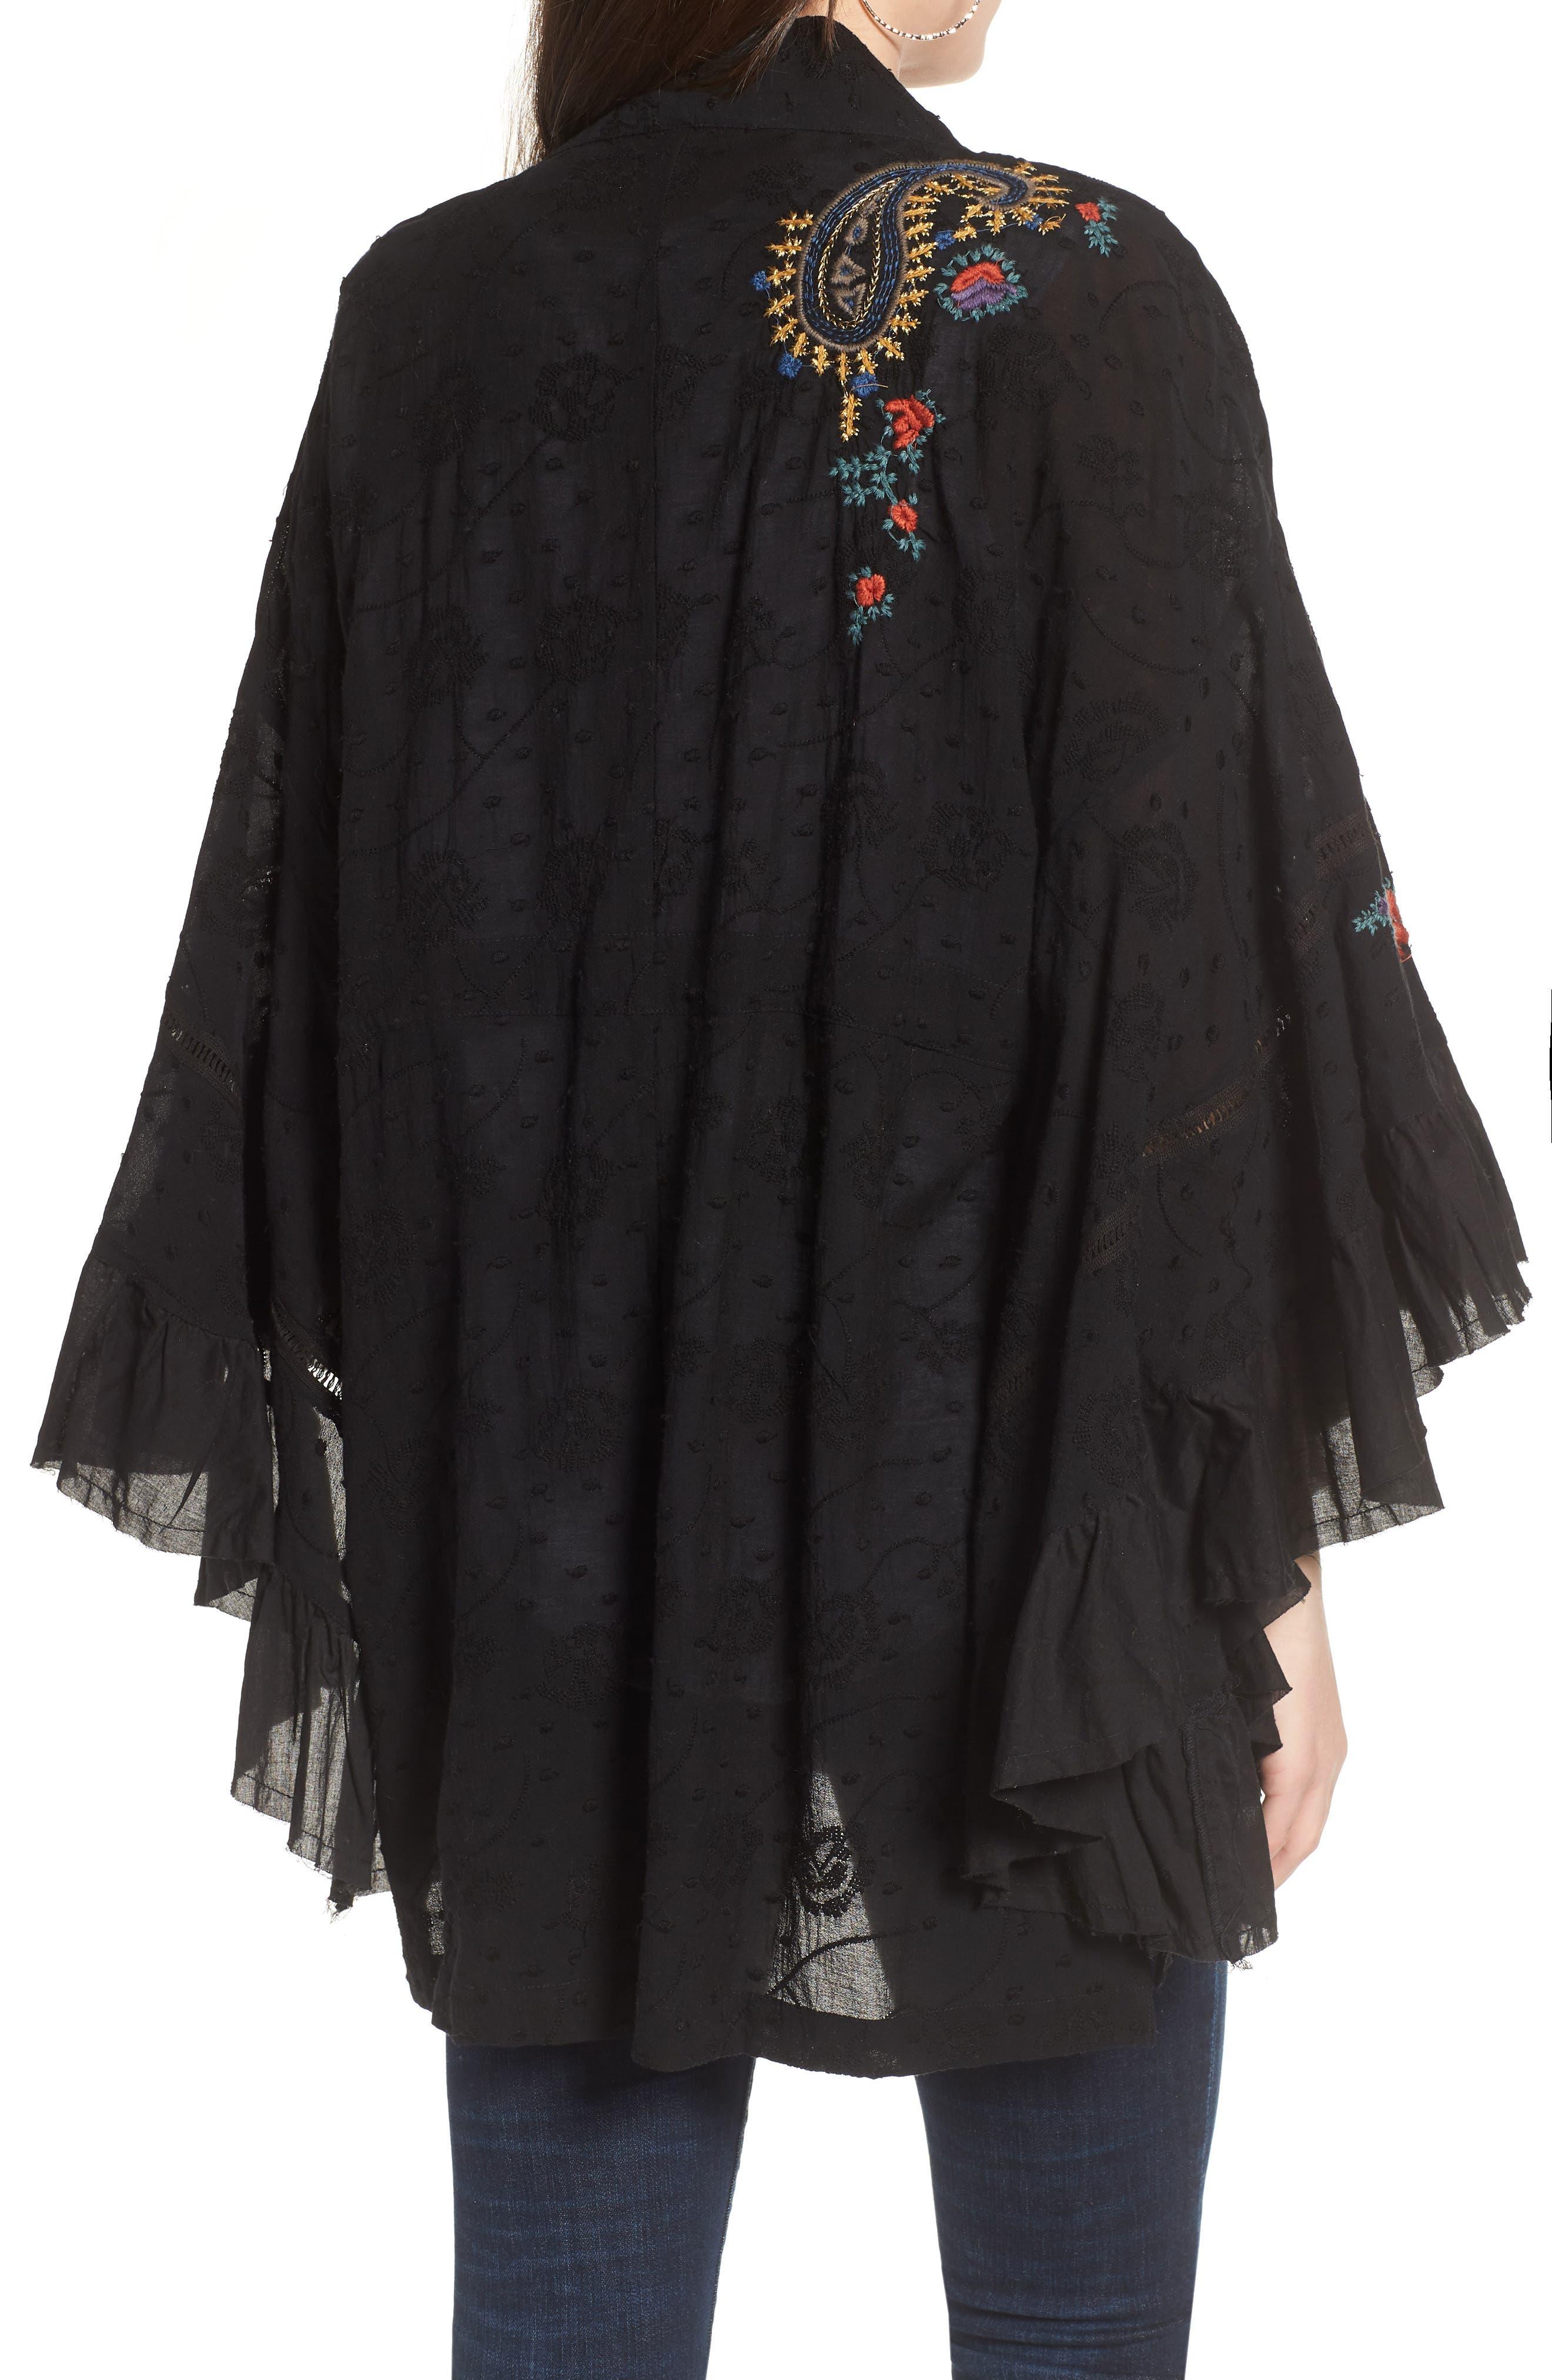 Dottie West Kimono,                             Alternate thumbnail 2, color,                             BLACK